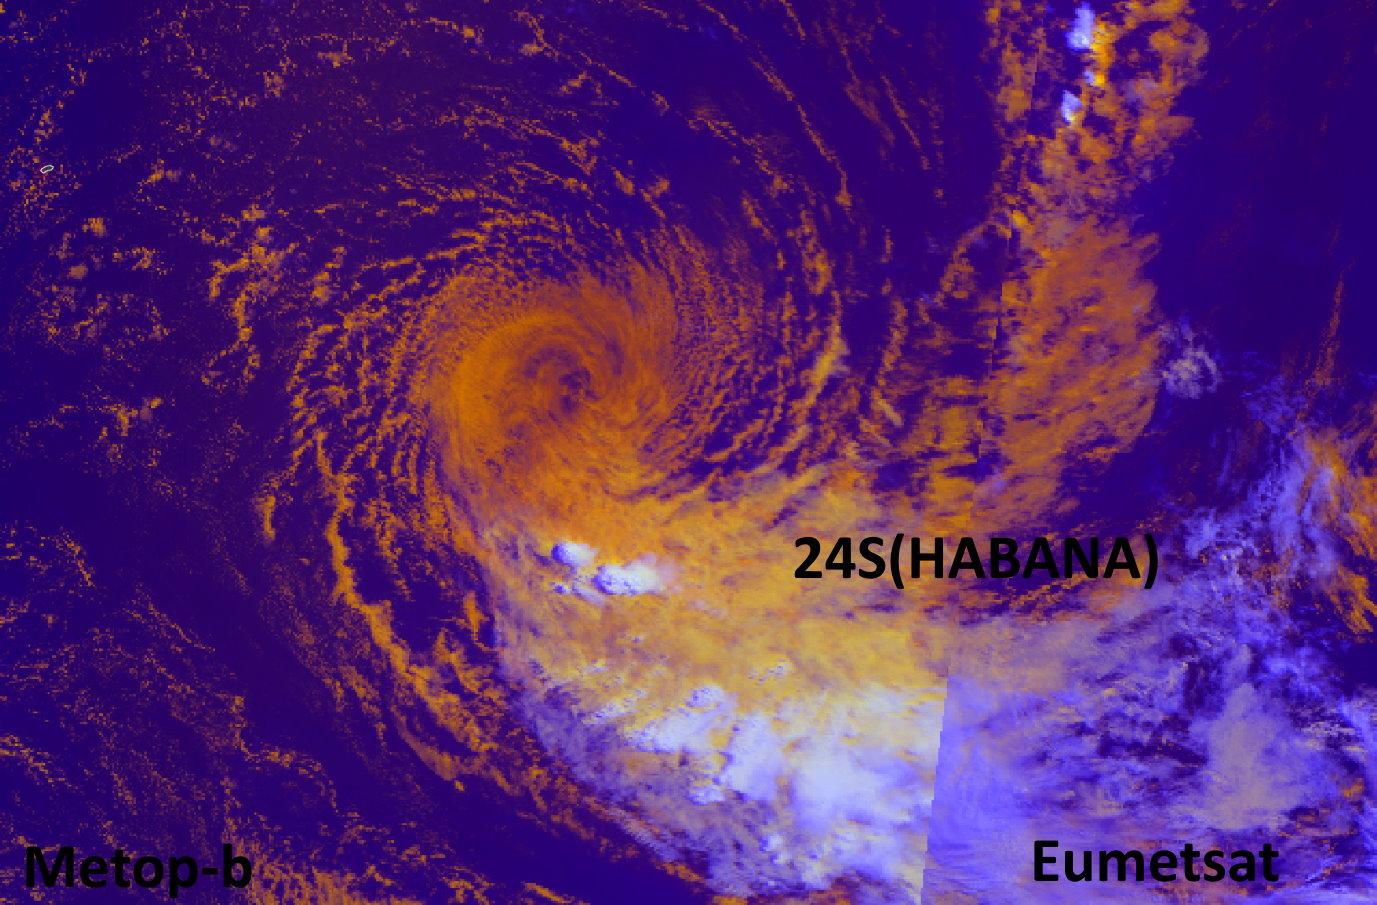 24S(HABANA). 16/0446UTC. METOP-B. Eumetsat. Enhanced by PH.